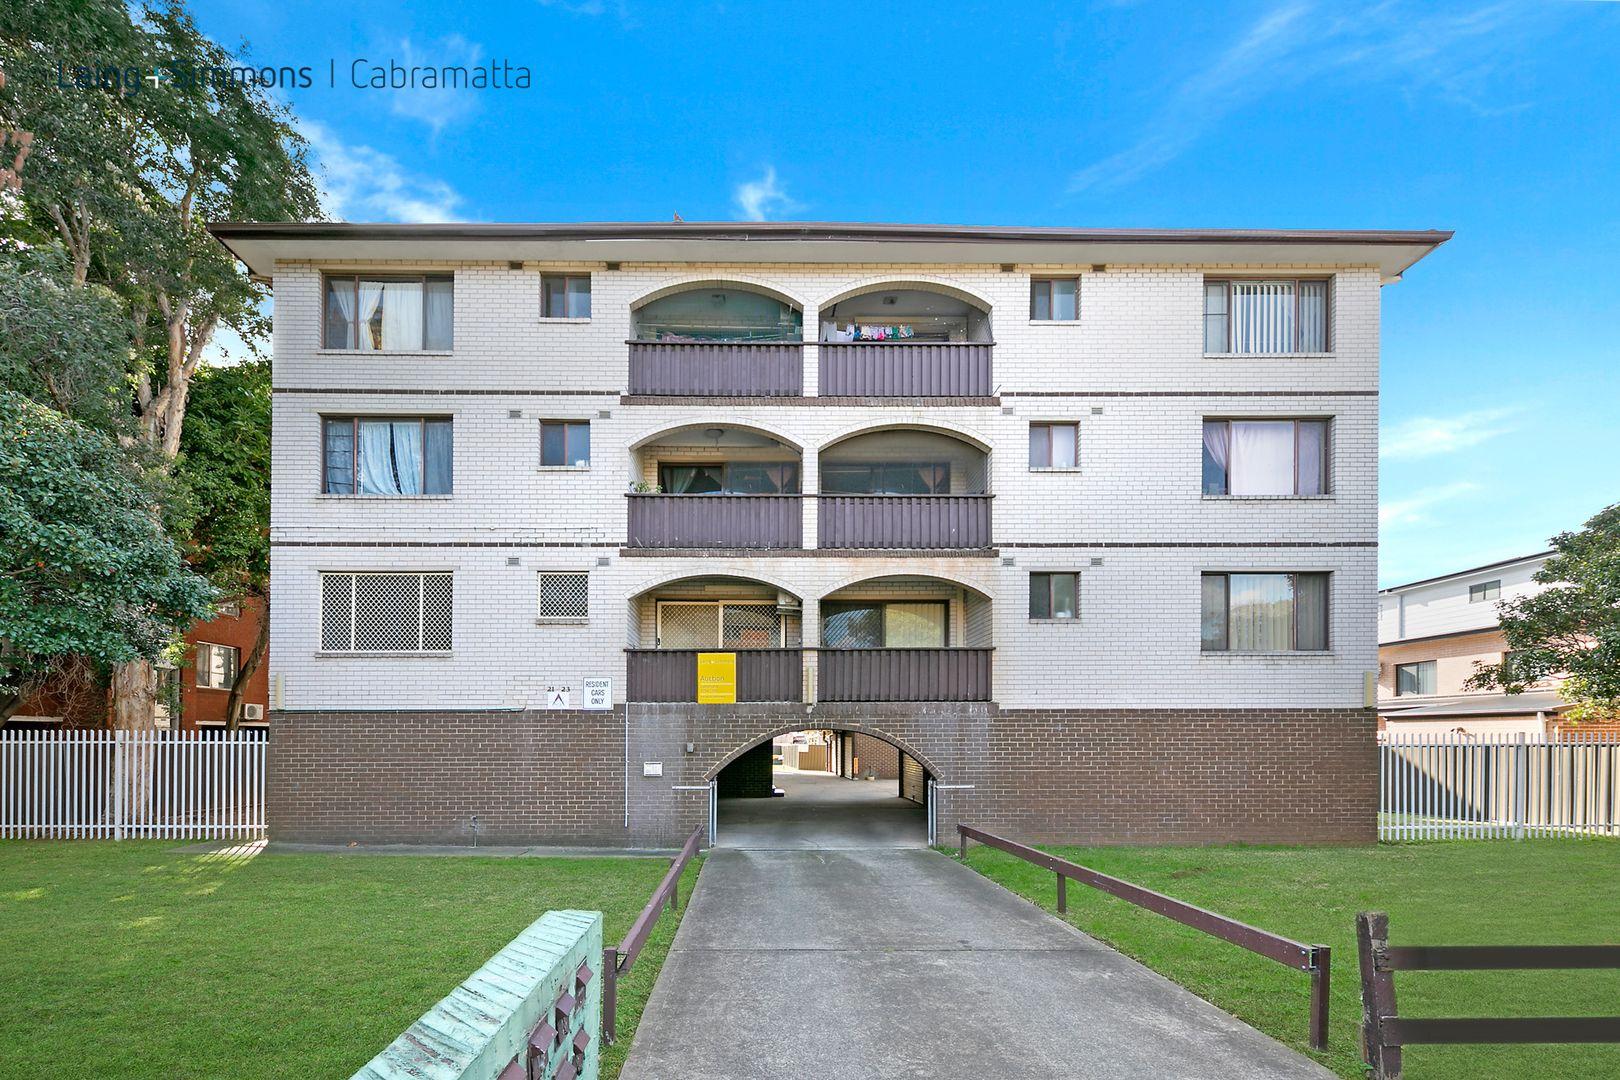 2/21-23 Mcburney Road, Cabramatta NSW 2166, Image 0